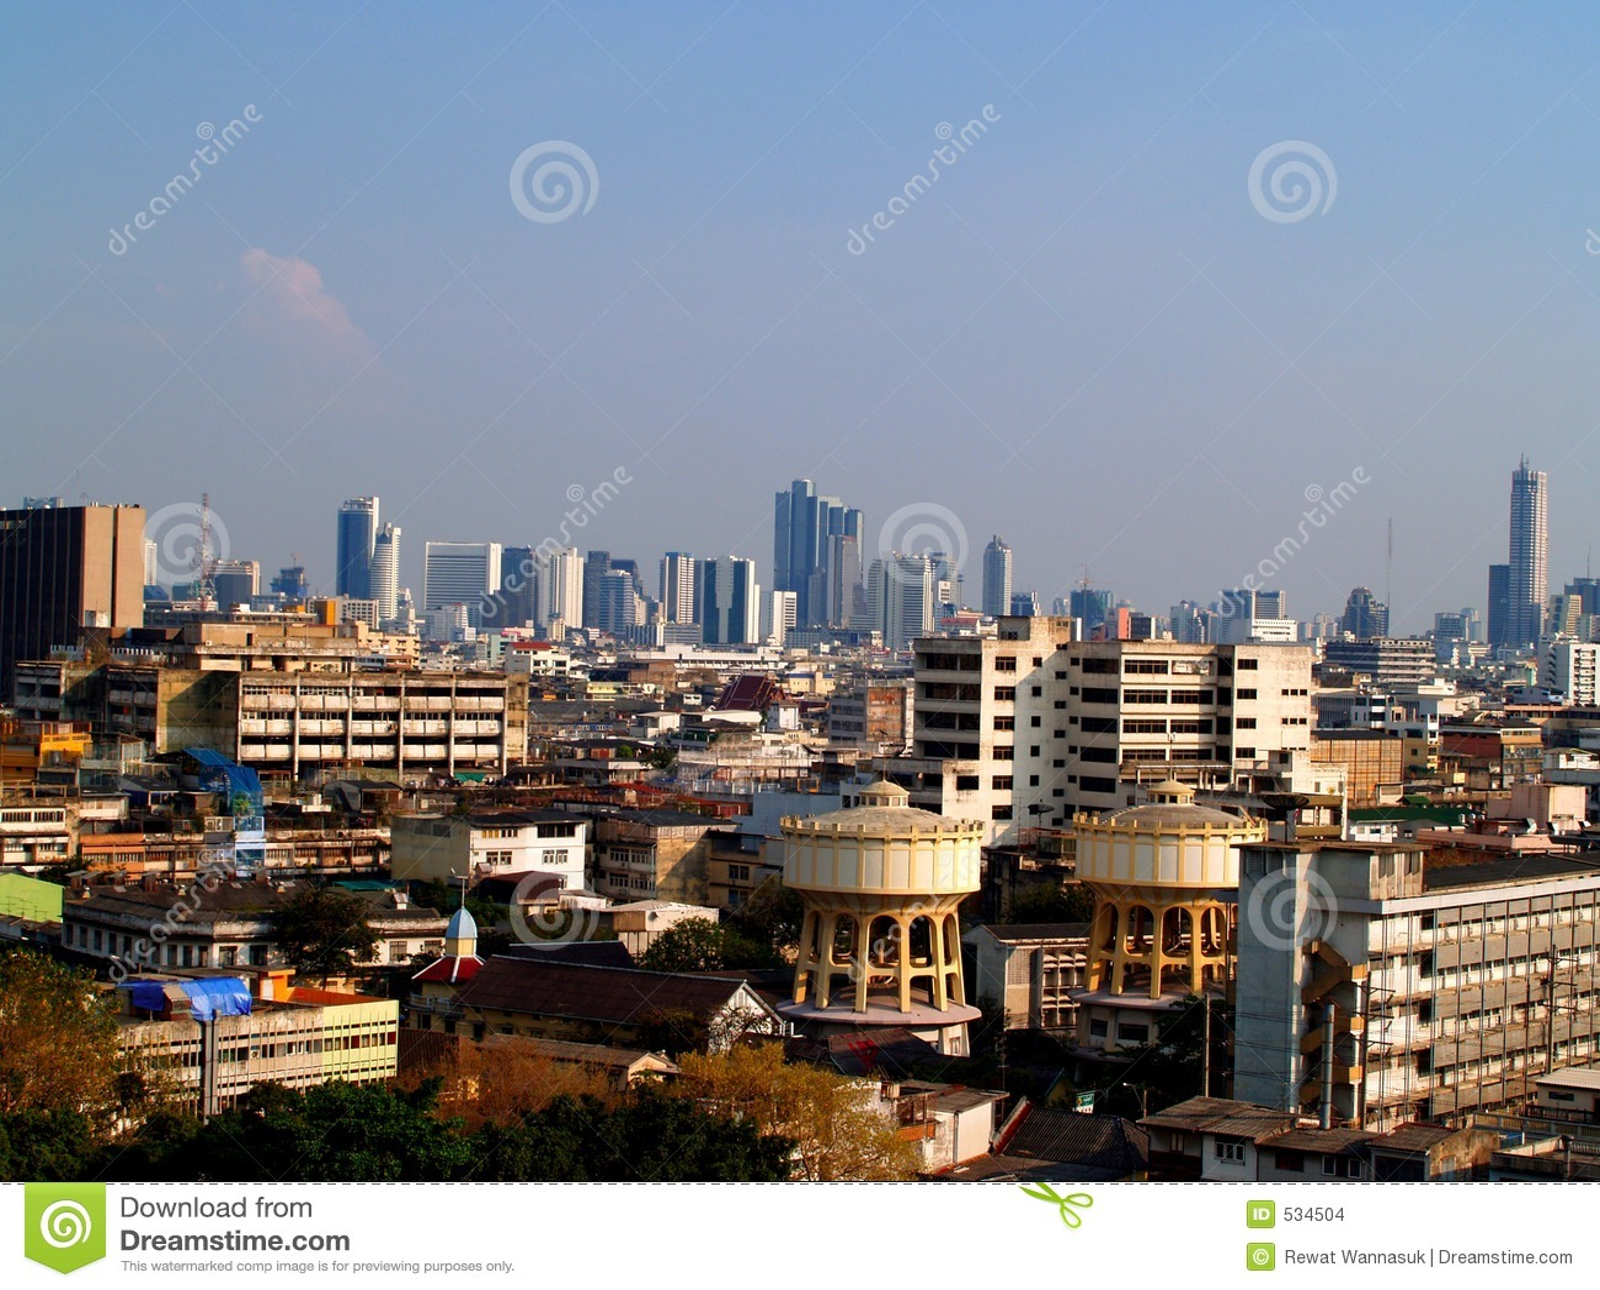 Download 03曼谷视图 库存照片. 图片 包括有 地平线, 天空, 摩天大楼, 运输, 城市, 中心, 泰国, 布哈拉 - 534504